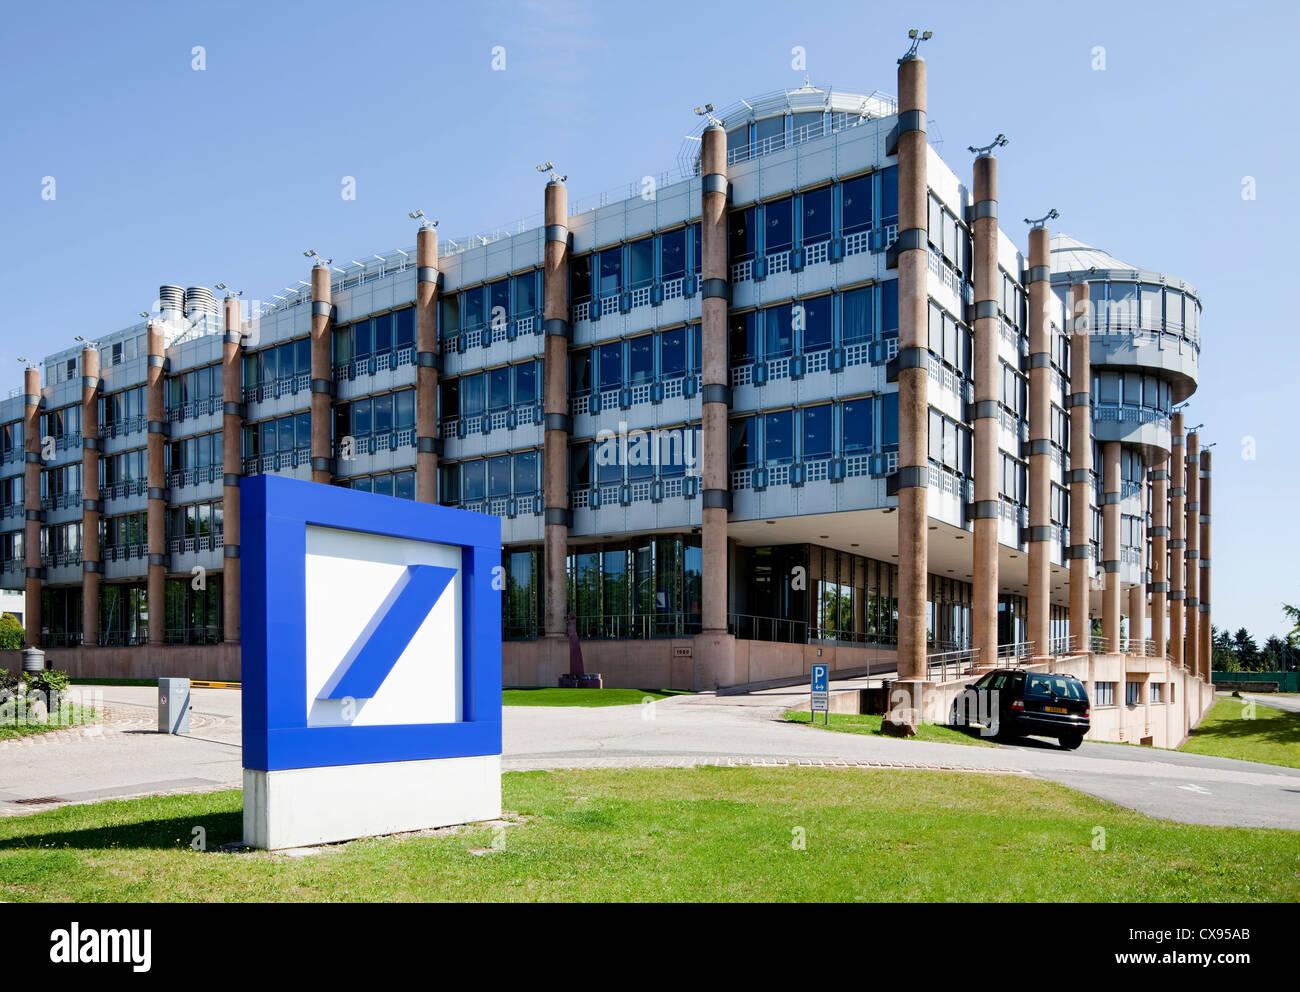 Deutsche Bank building, Kirchberg district, city of Luxembourg, Europe - Stock Image